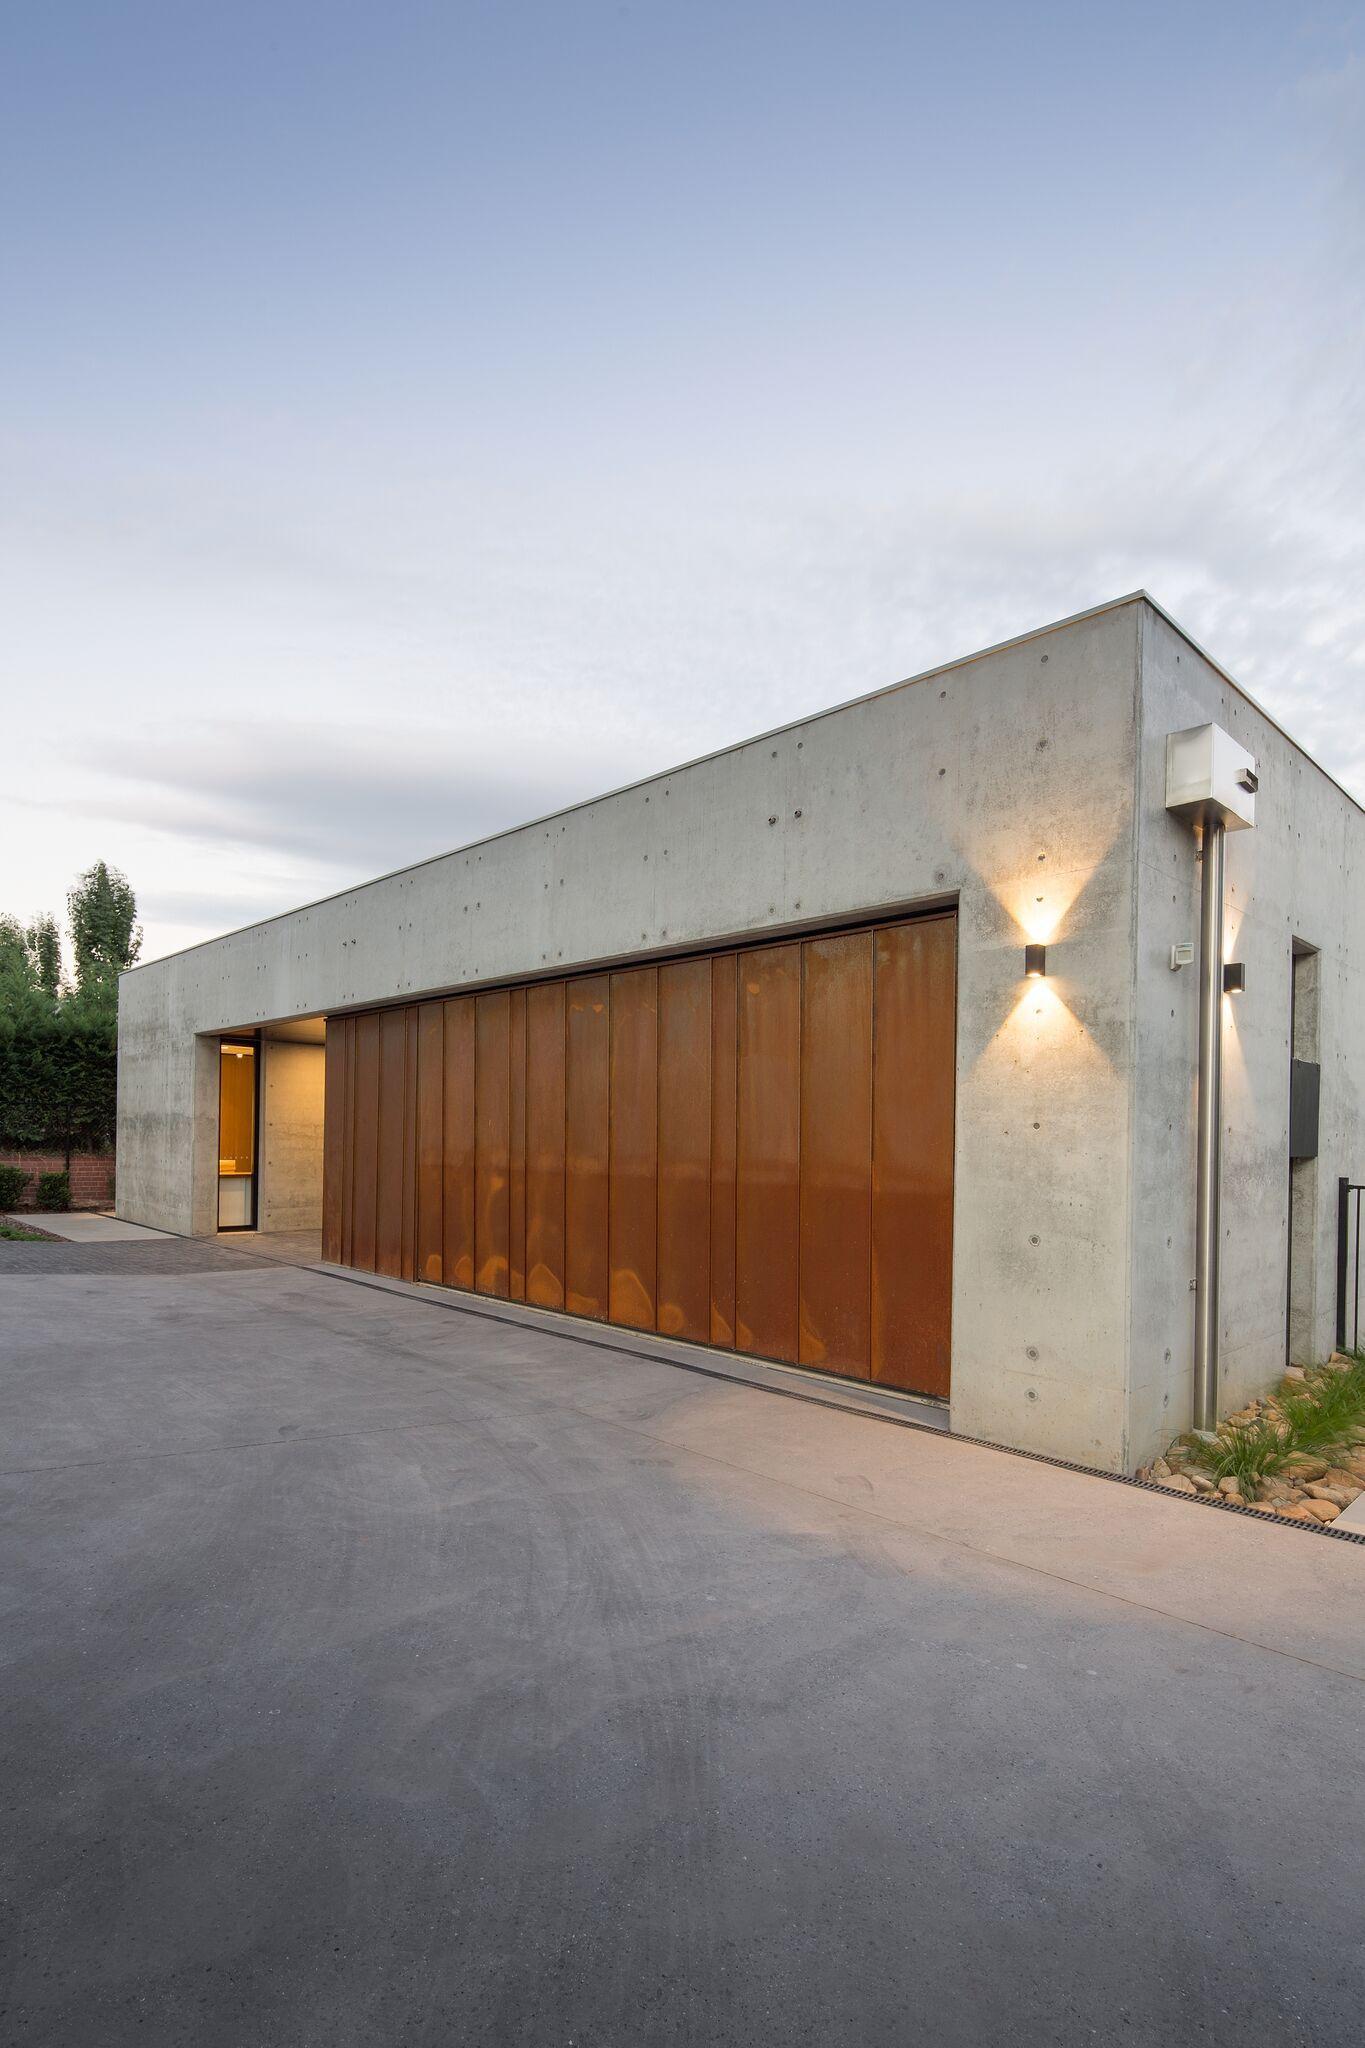 Banks-Street-Yarralumla - corten garage and concrete. Builder Ross Catoi Full & Banks-Street-Yarralumla - corten garage and concrete. Builder Ross ... pezcame.com